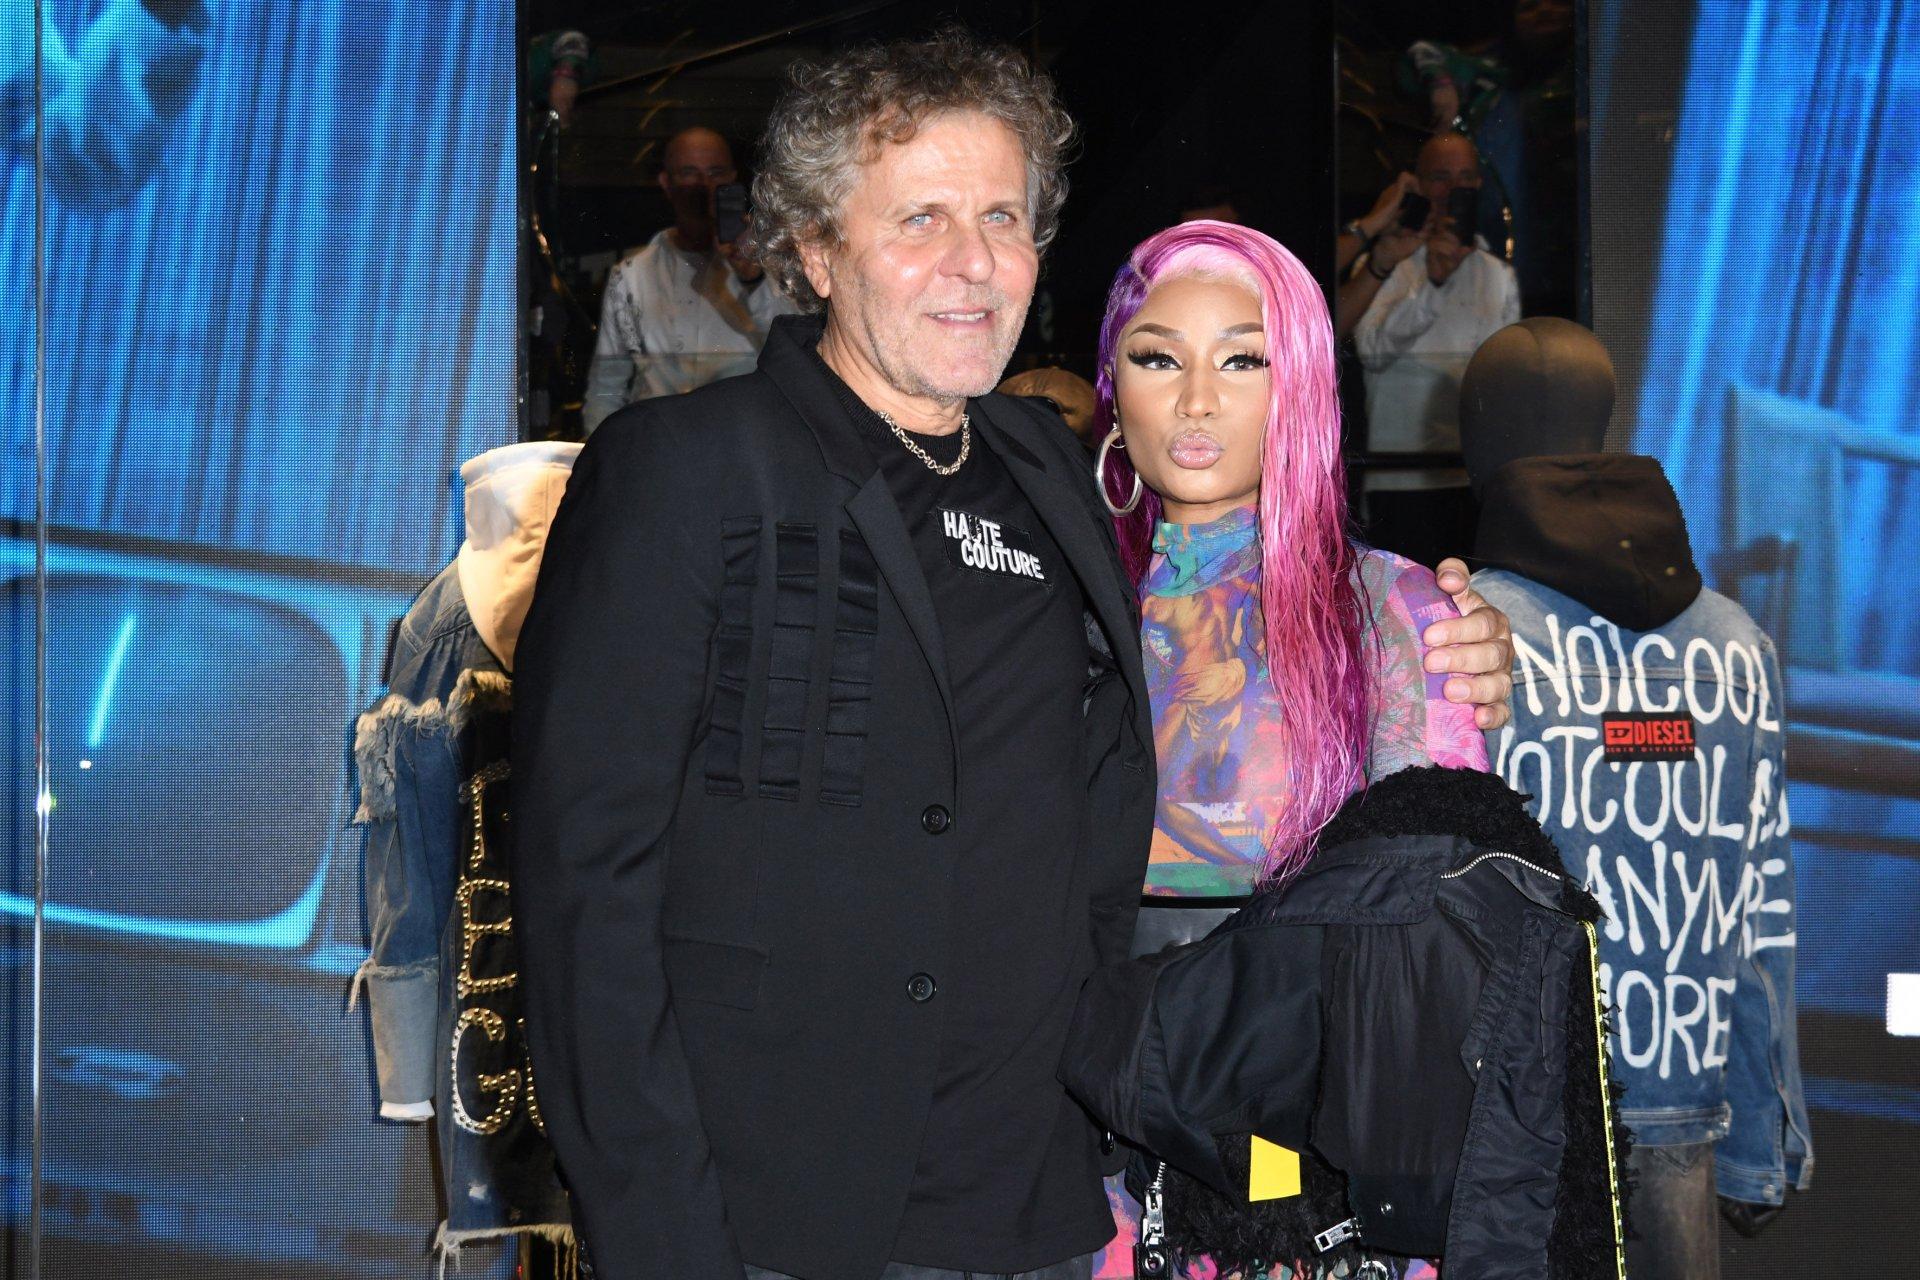 Nicki-Minaj-See-Through-TheFappeningBlog.com-42.jpg